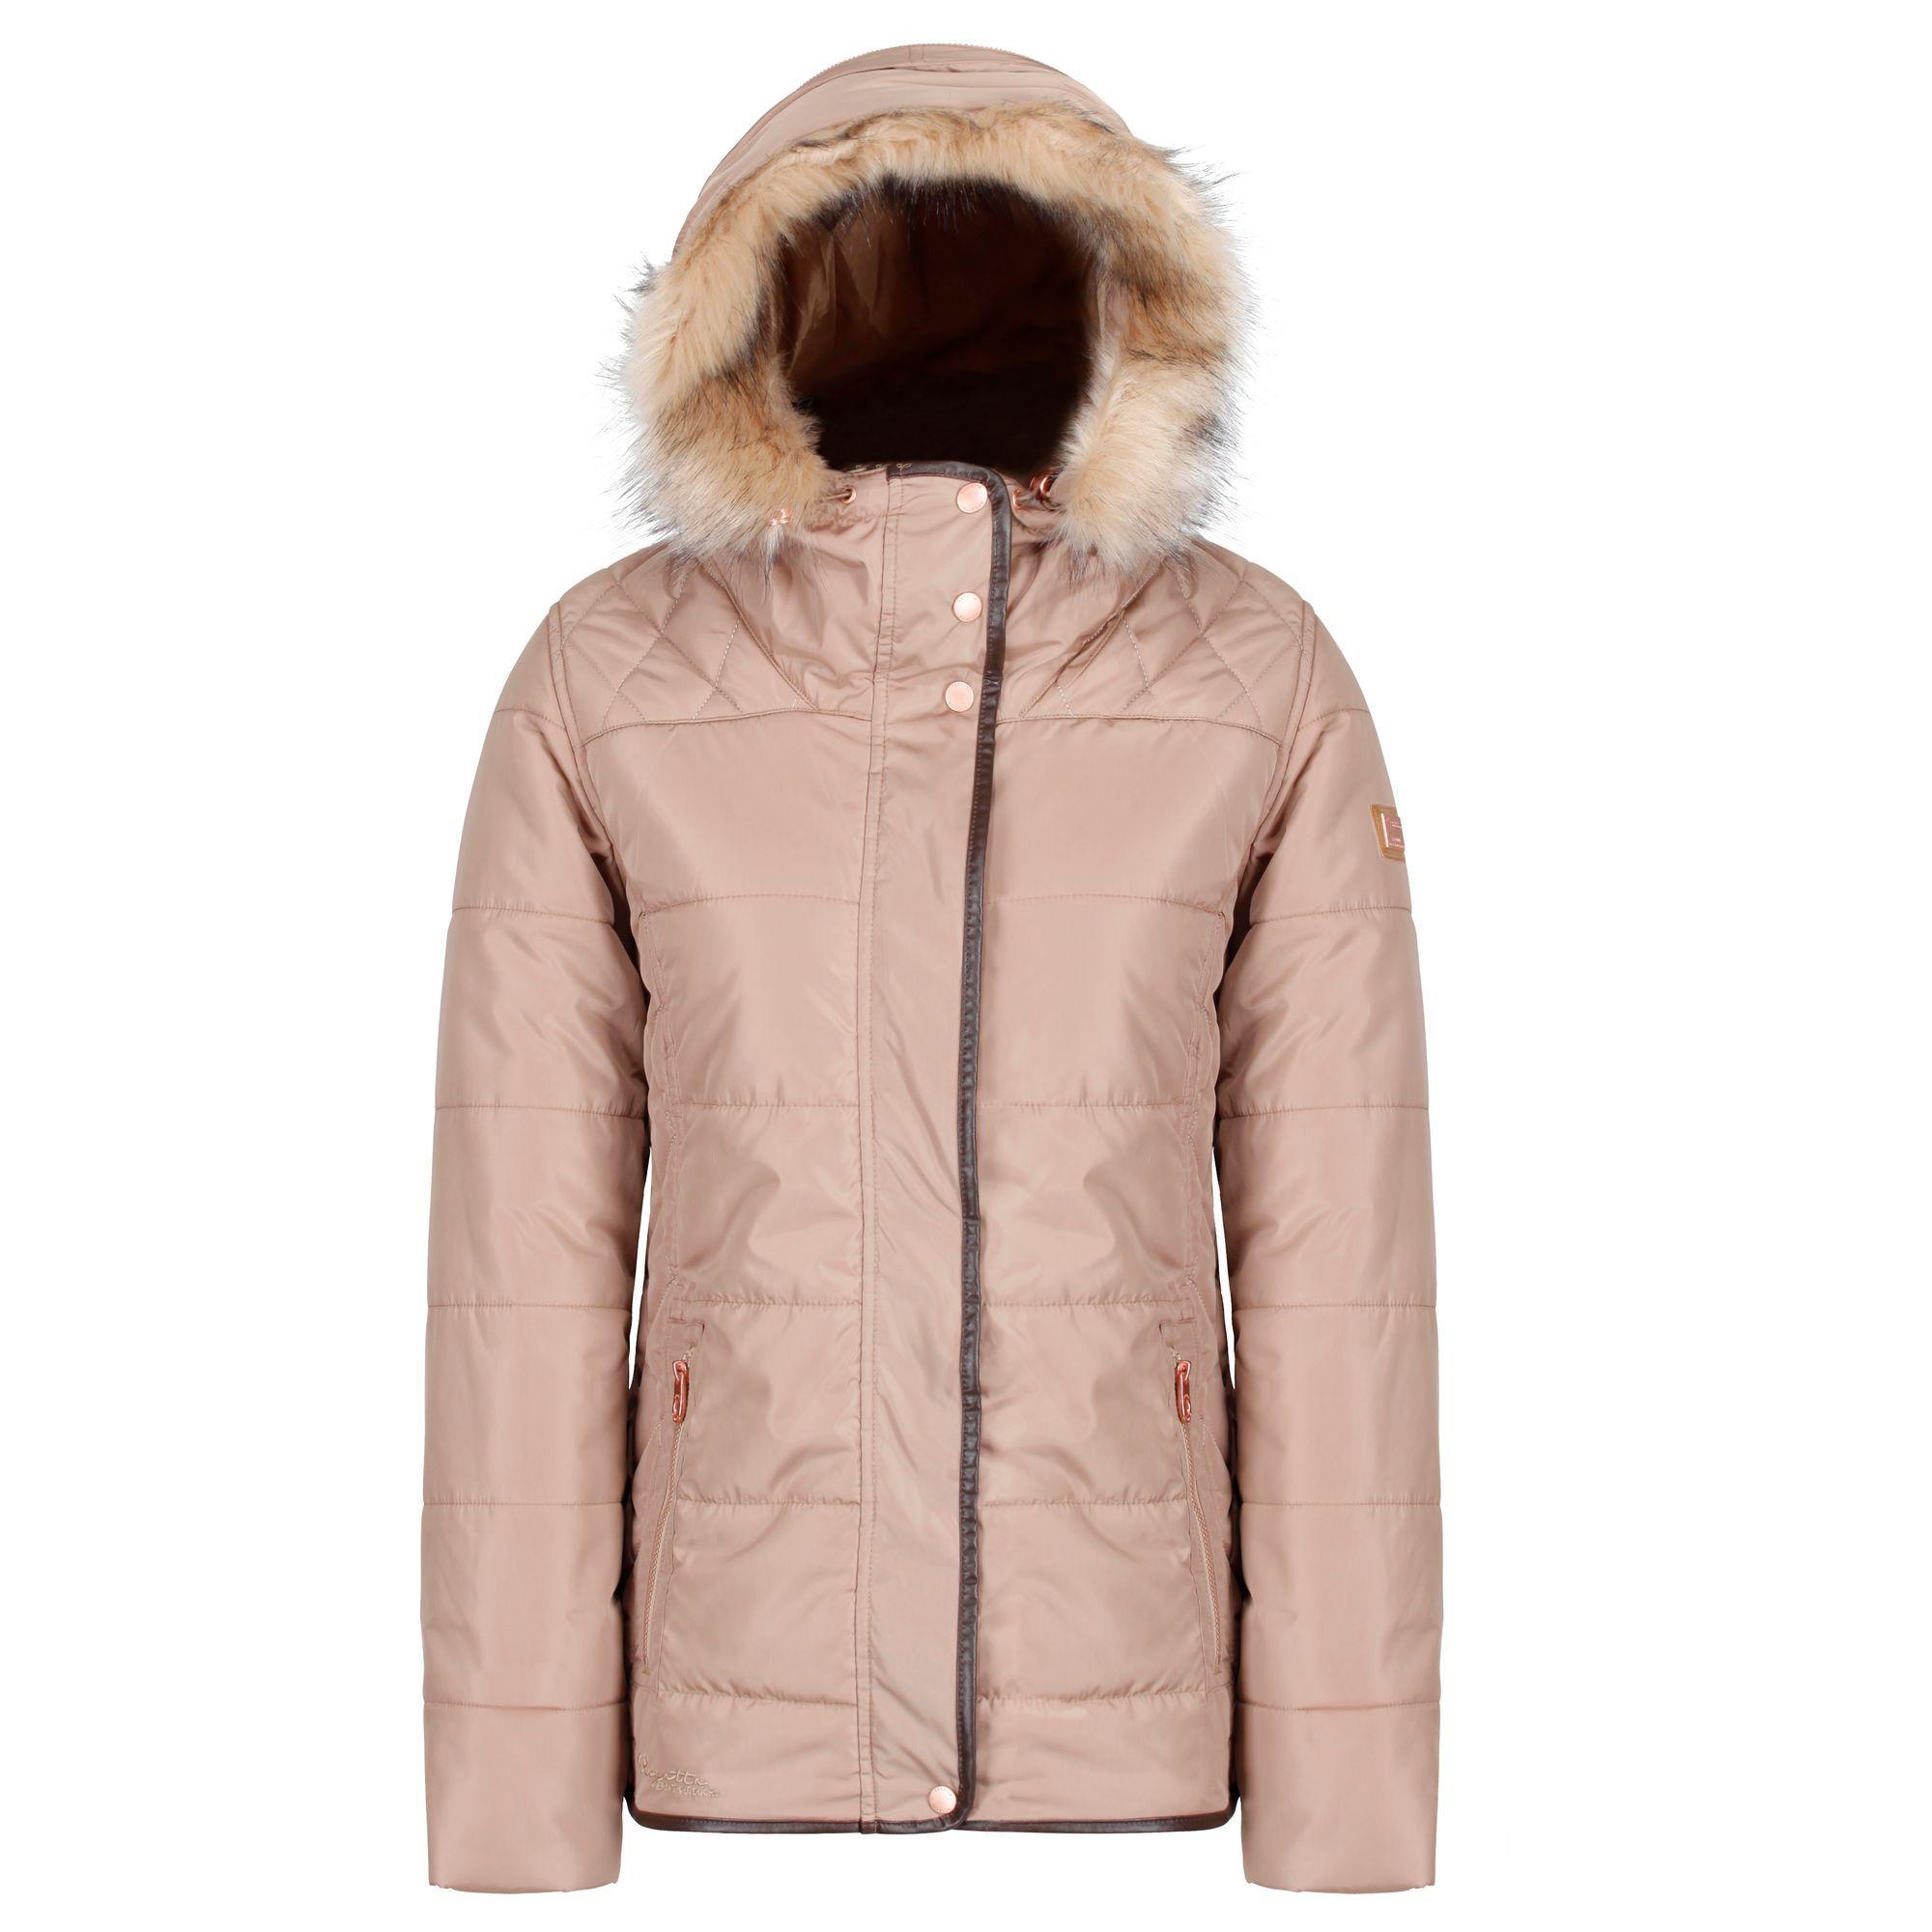 Regatta Womens/Ladies Winika Hooded Jacket